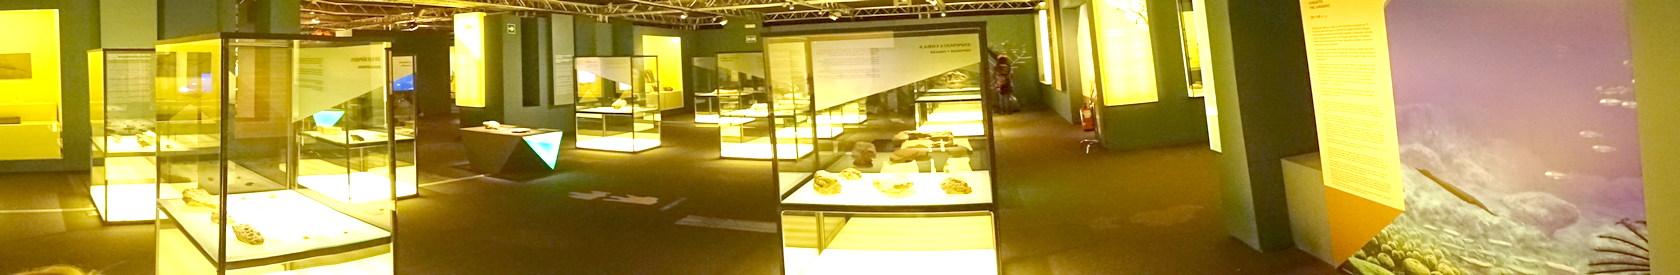 Exposiciones Paleontológicas